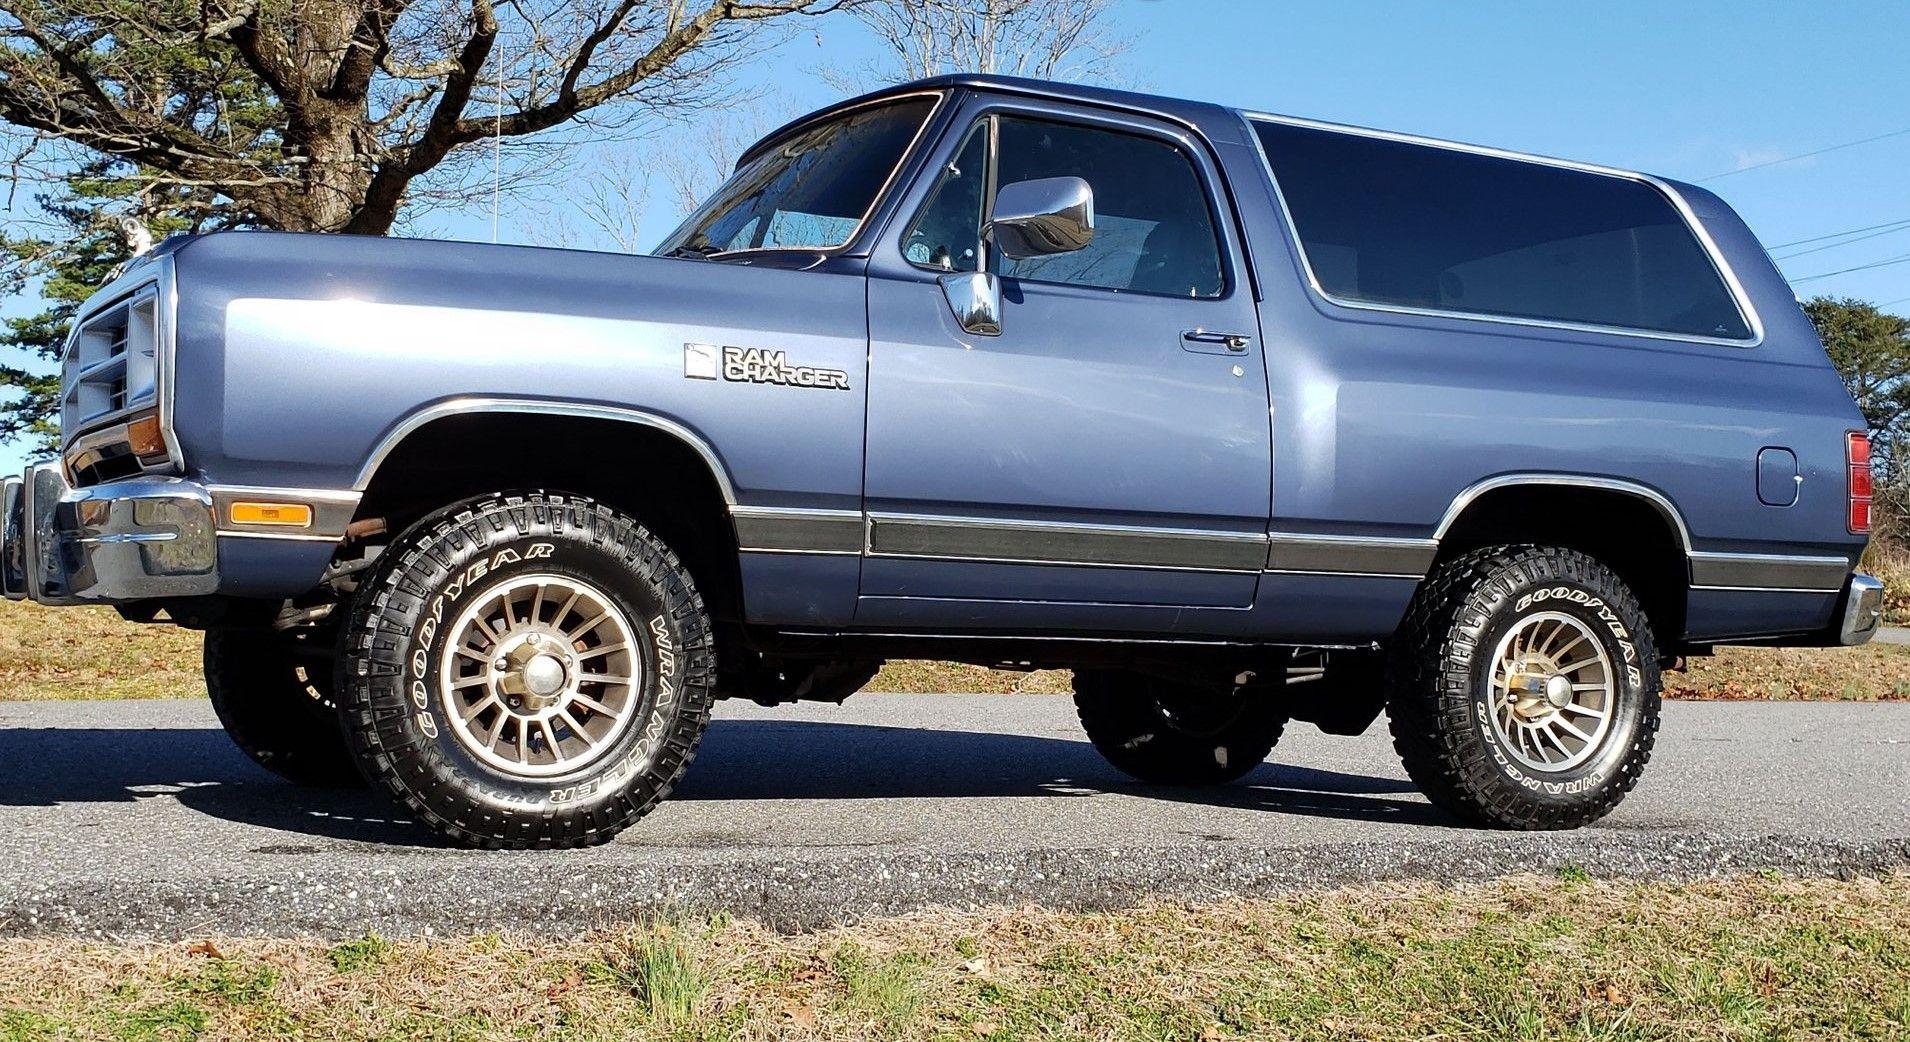 Grab A 1988 Dodge Ramcharger For Under 15k